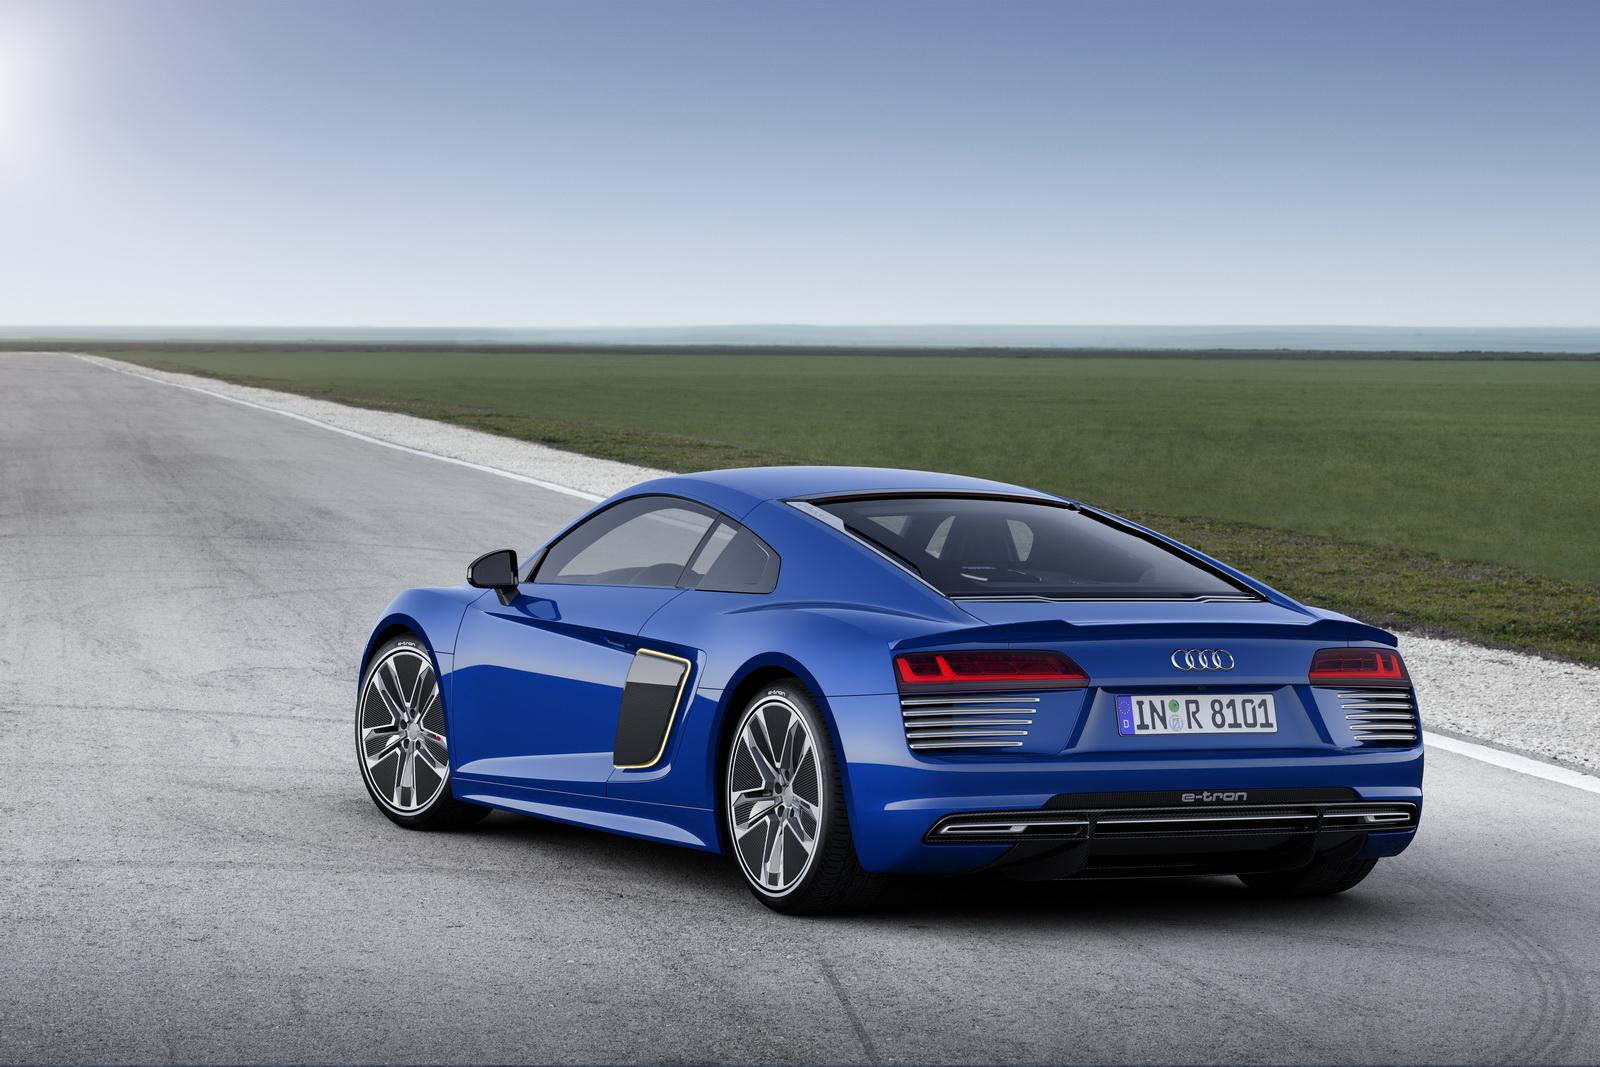 Audi Confirms Development Of BMW i8 Rival